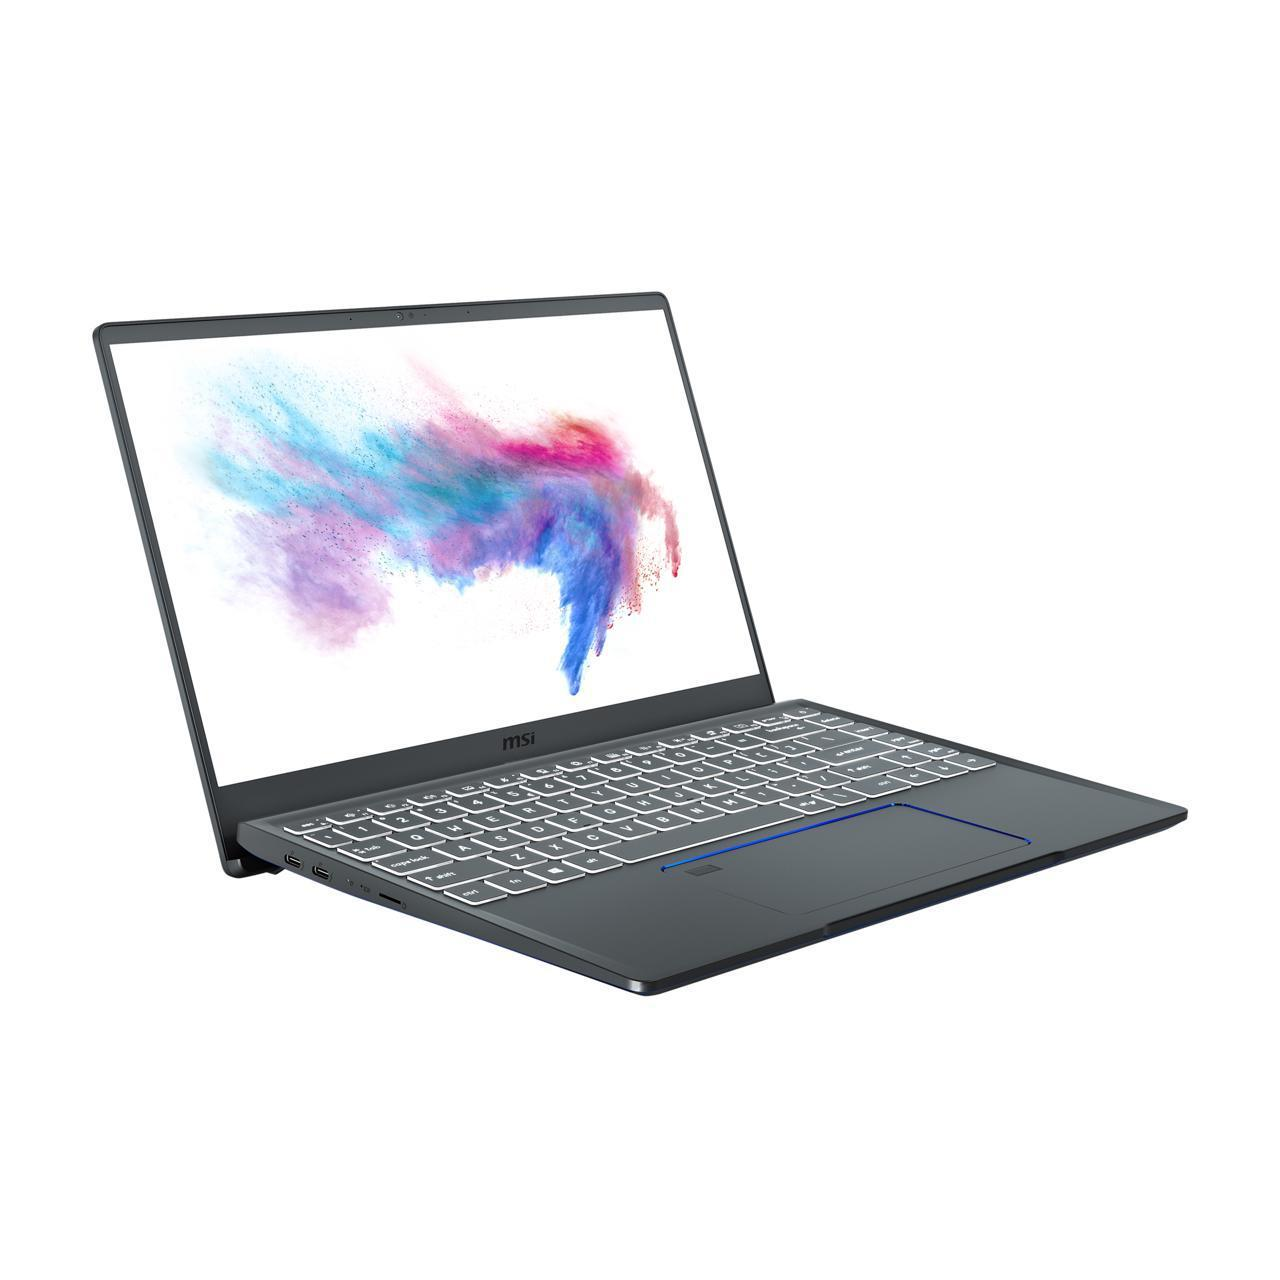 MSI Prestige 14 A10SC-246CA 14-inch - Core i7-10710U - 16GB 512GB NVIDIA GeForce GTX 1650 Max-Q QWERTY - English (US)